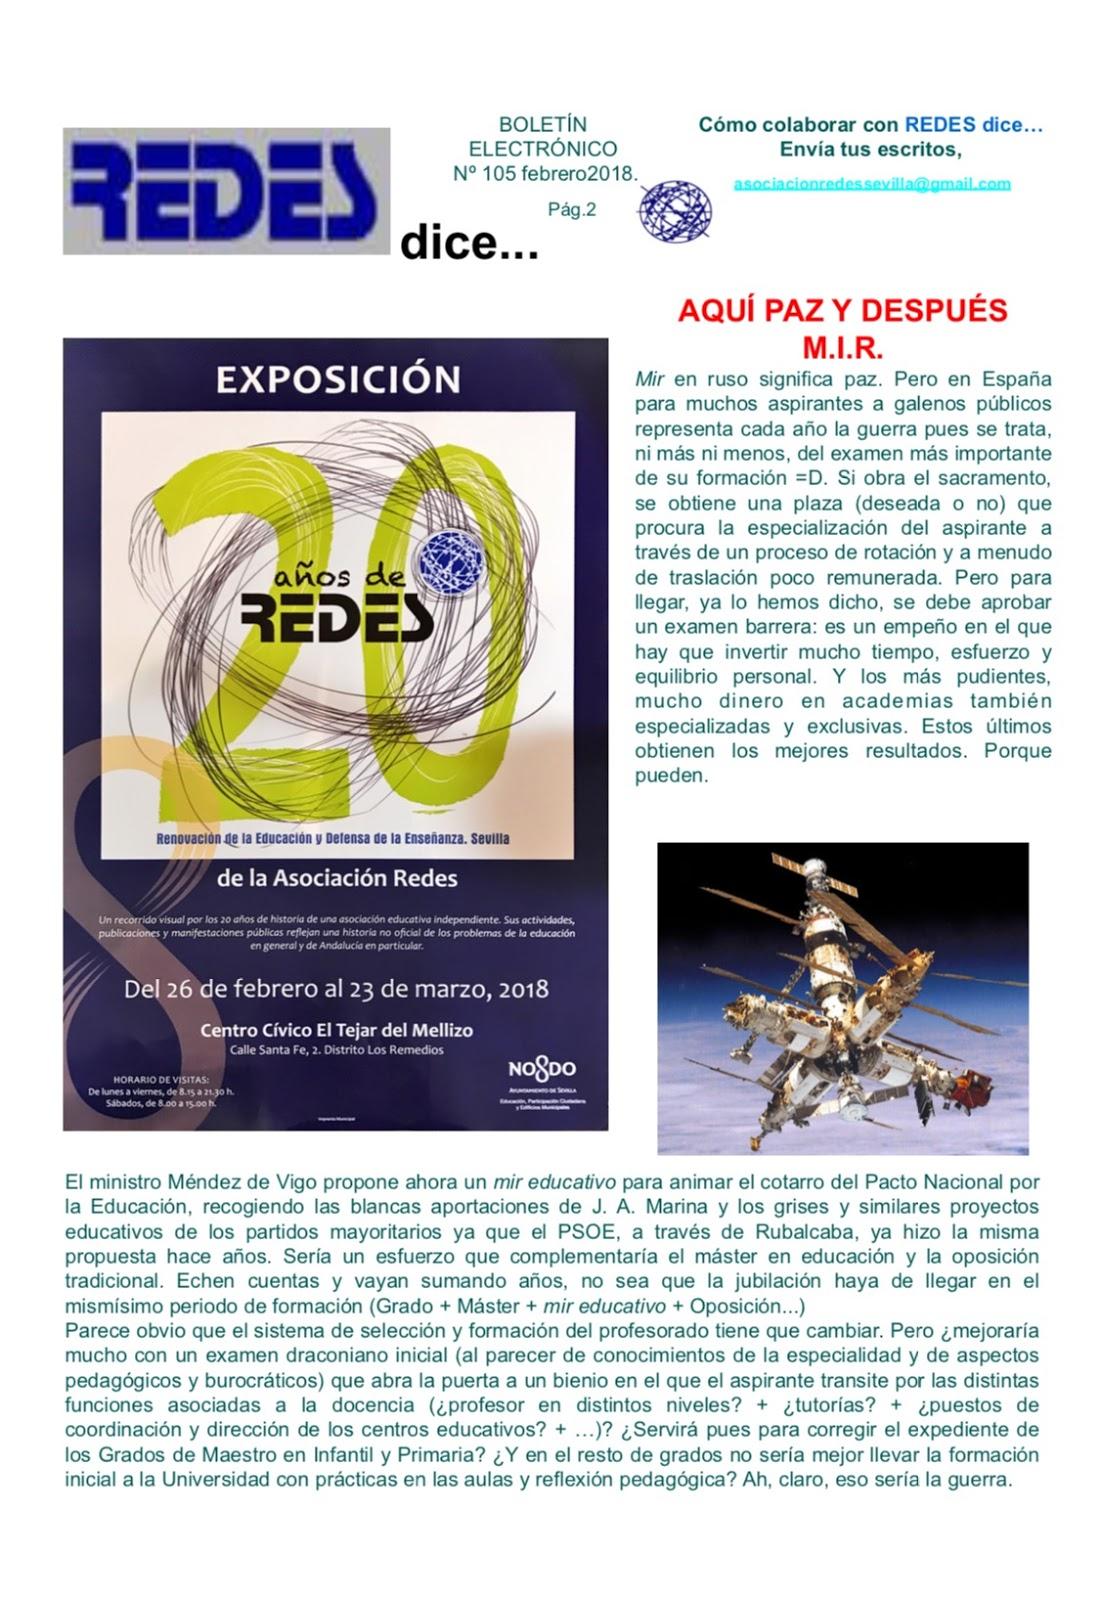 Boletín Electrónico REDES dice...